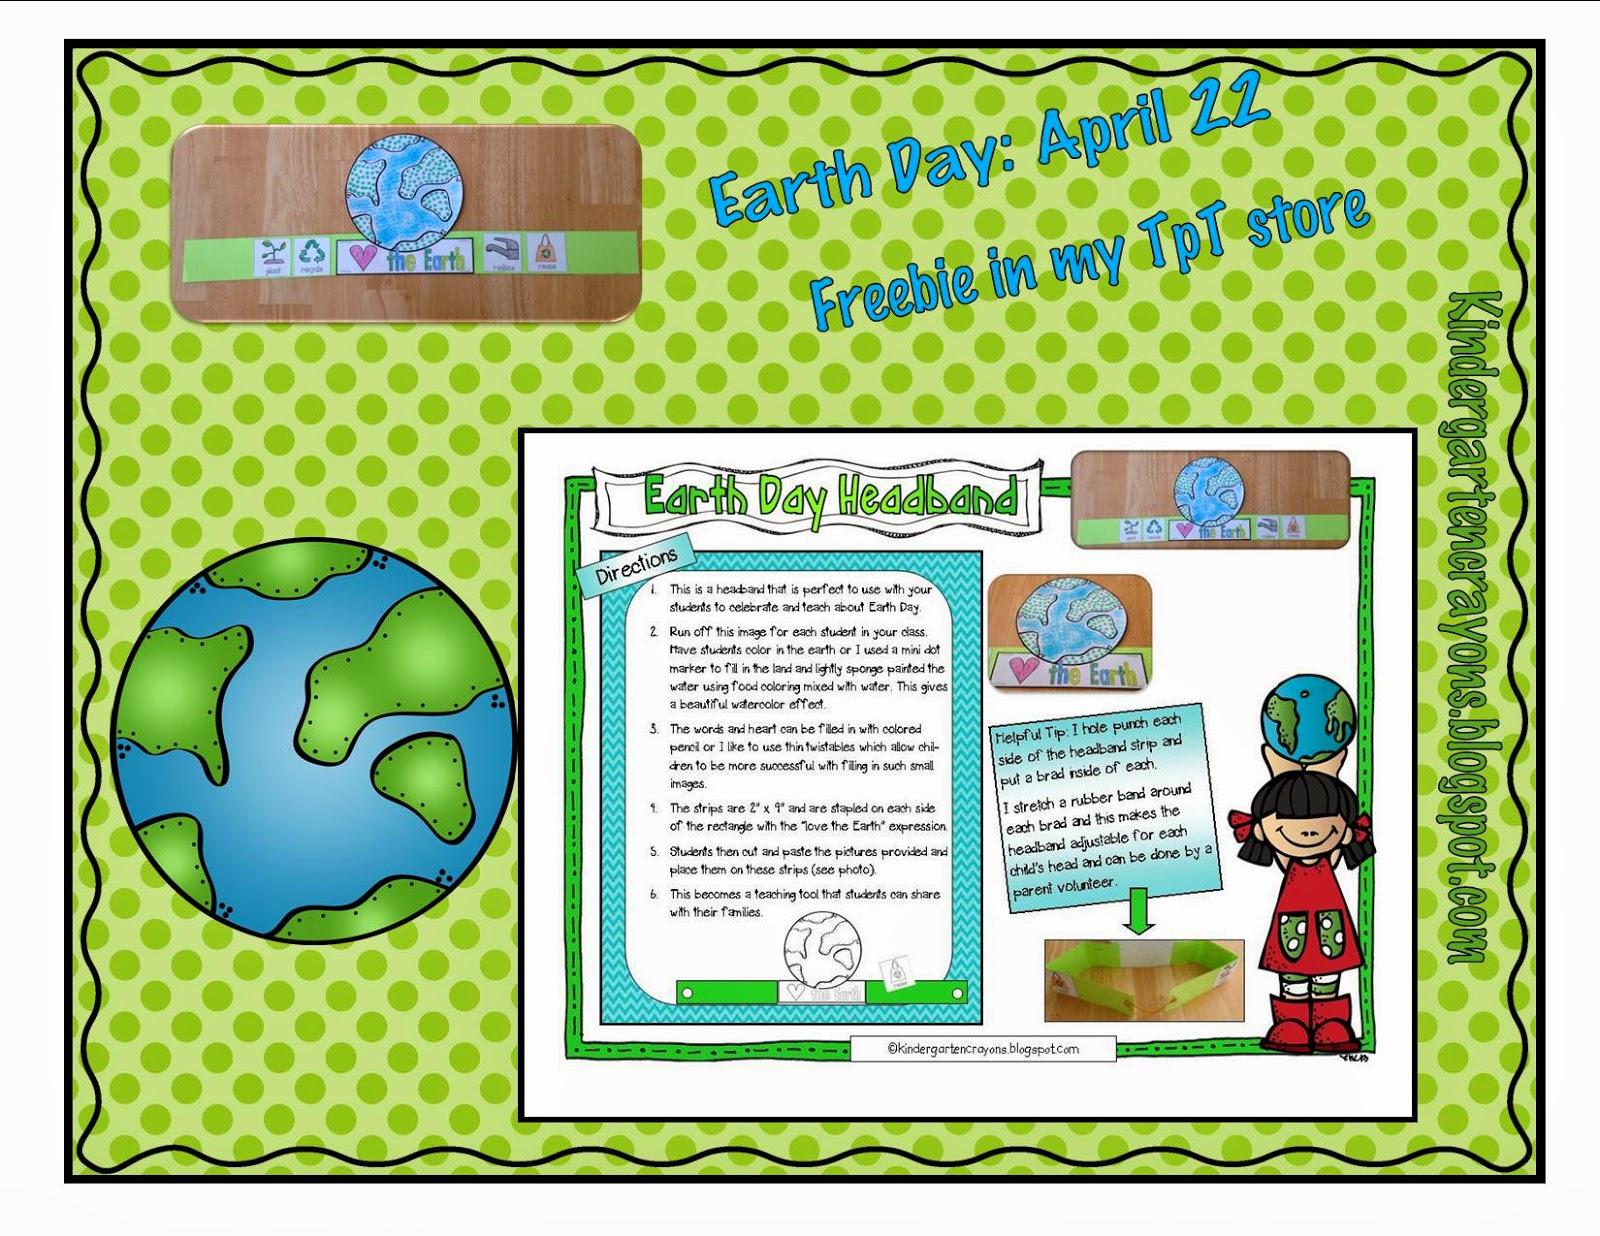 Kindergarten Crayons Finally A Freebie Celebrate Earth Day With Your Kindergarten